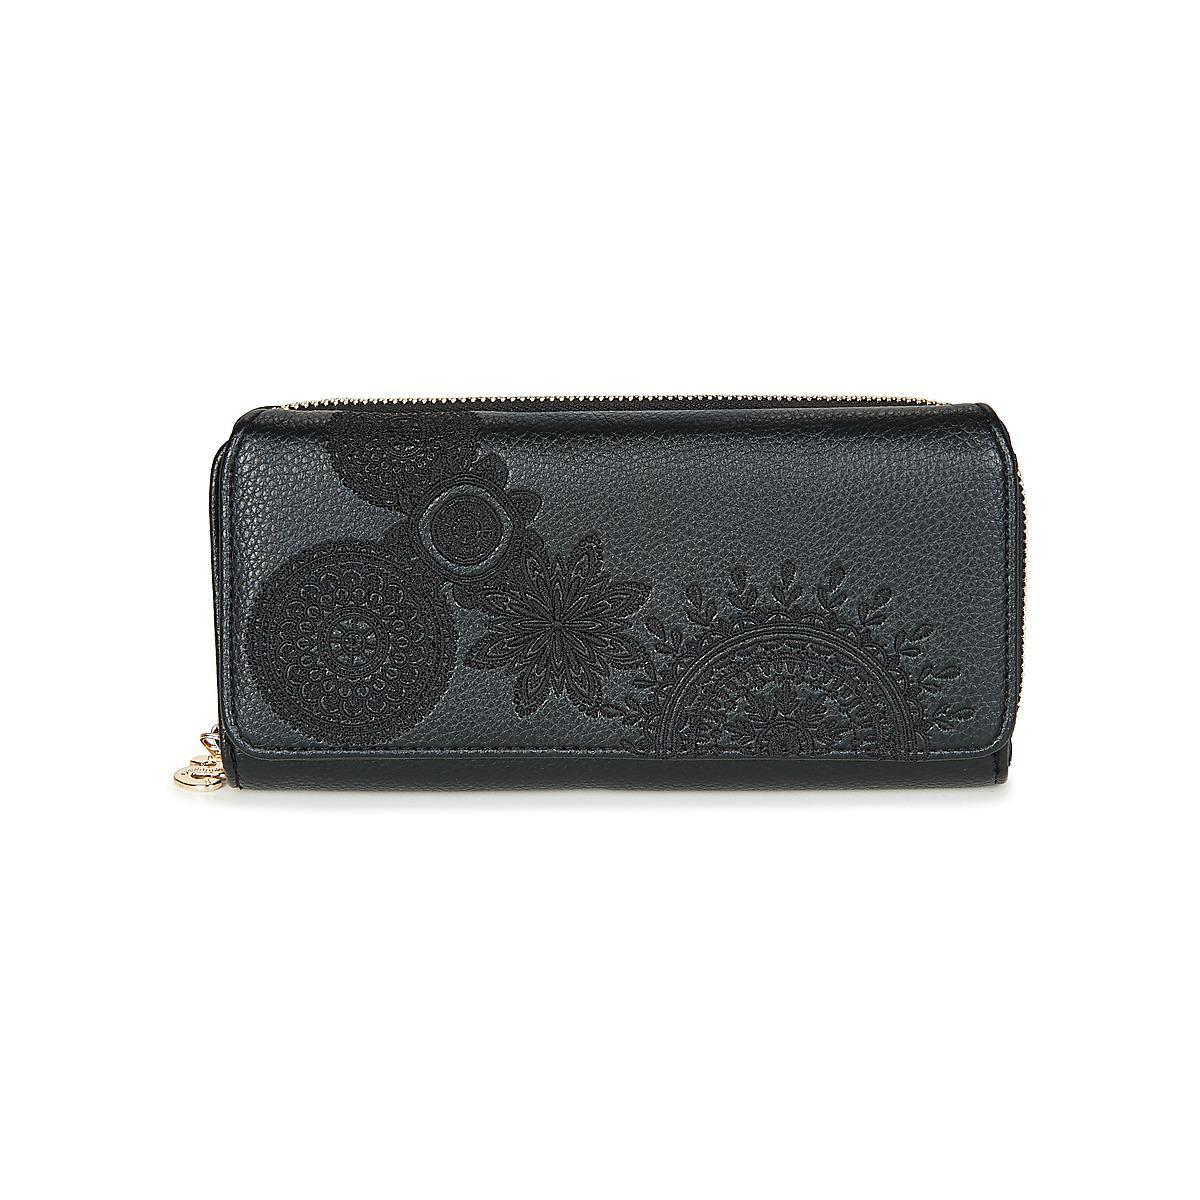 560fbbe22ad Desigual Mone Maria Dark Amber Women's Purse Wallet In Black in ...